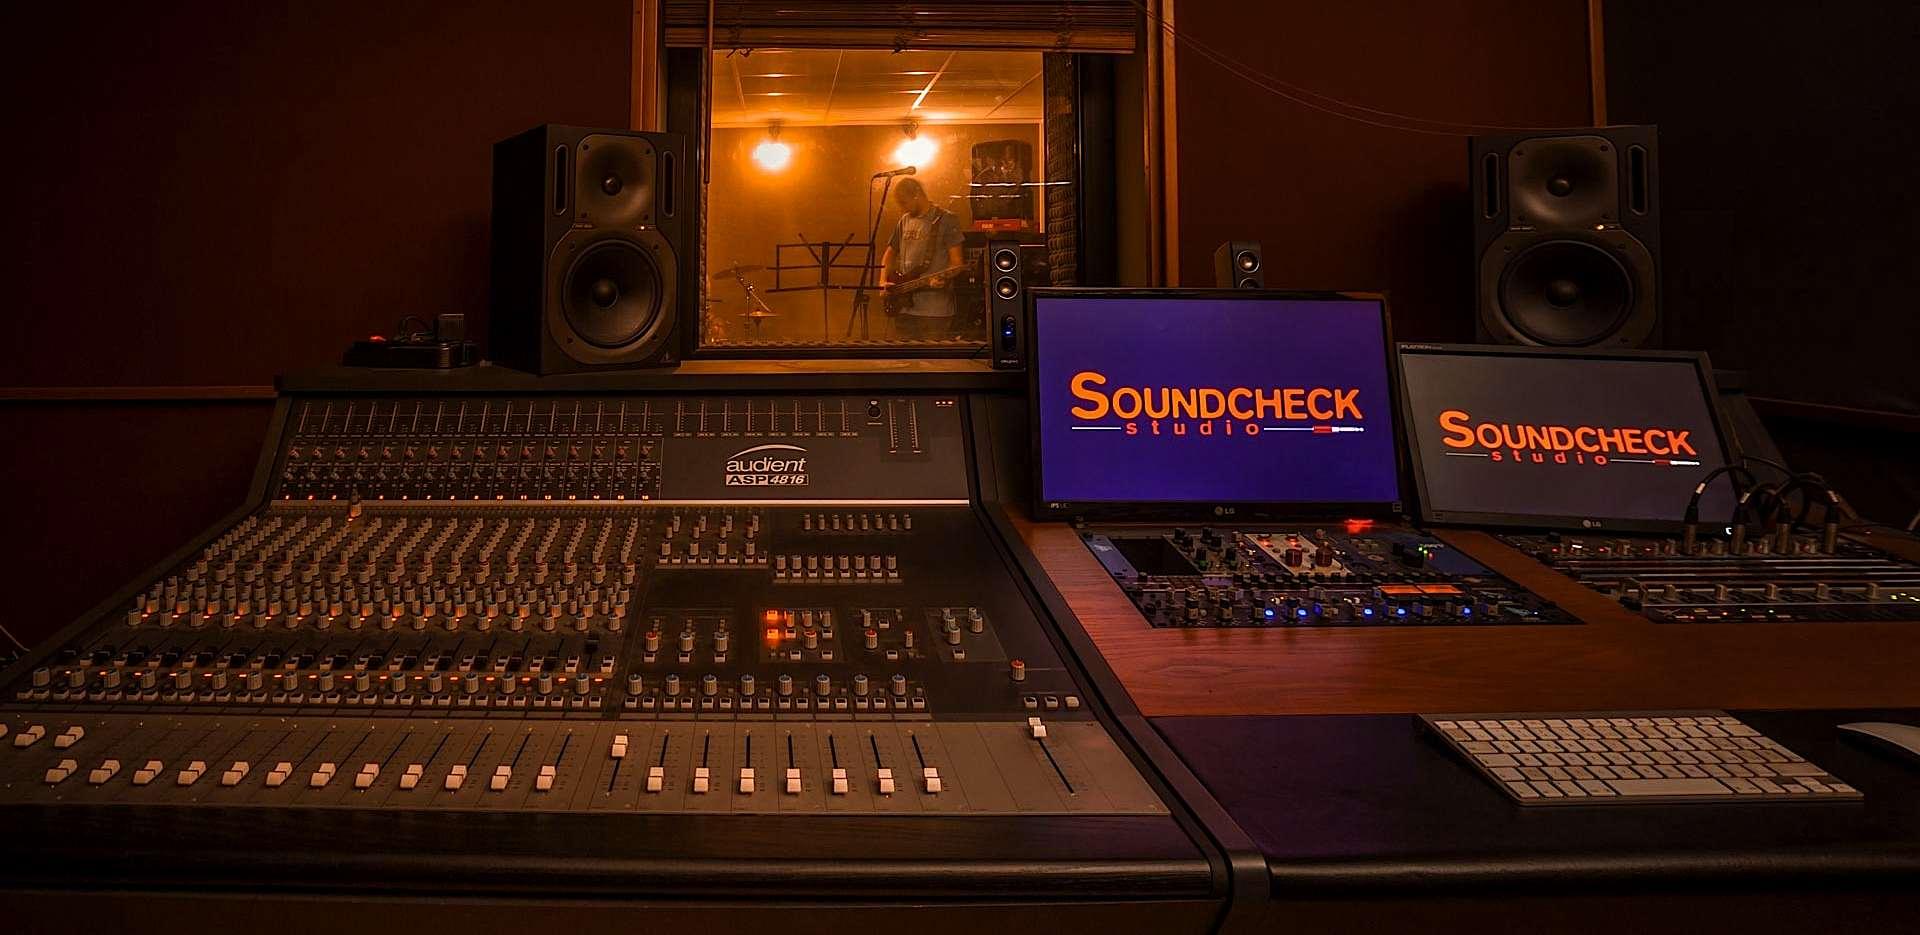 Regia recording studio Milano Soundcheck